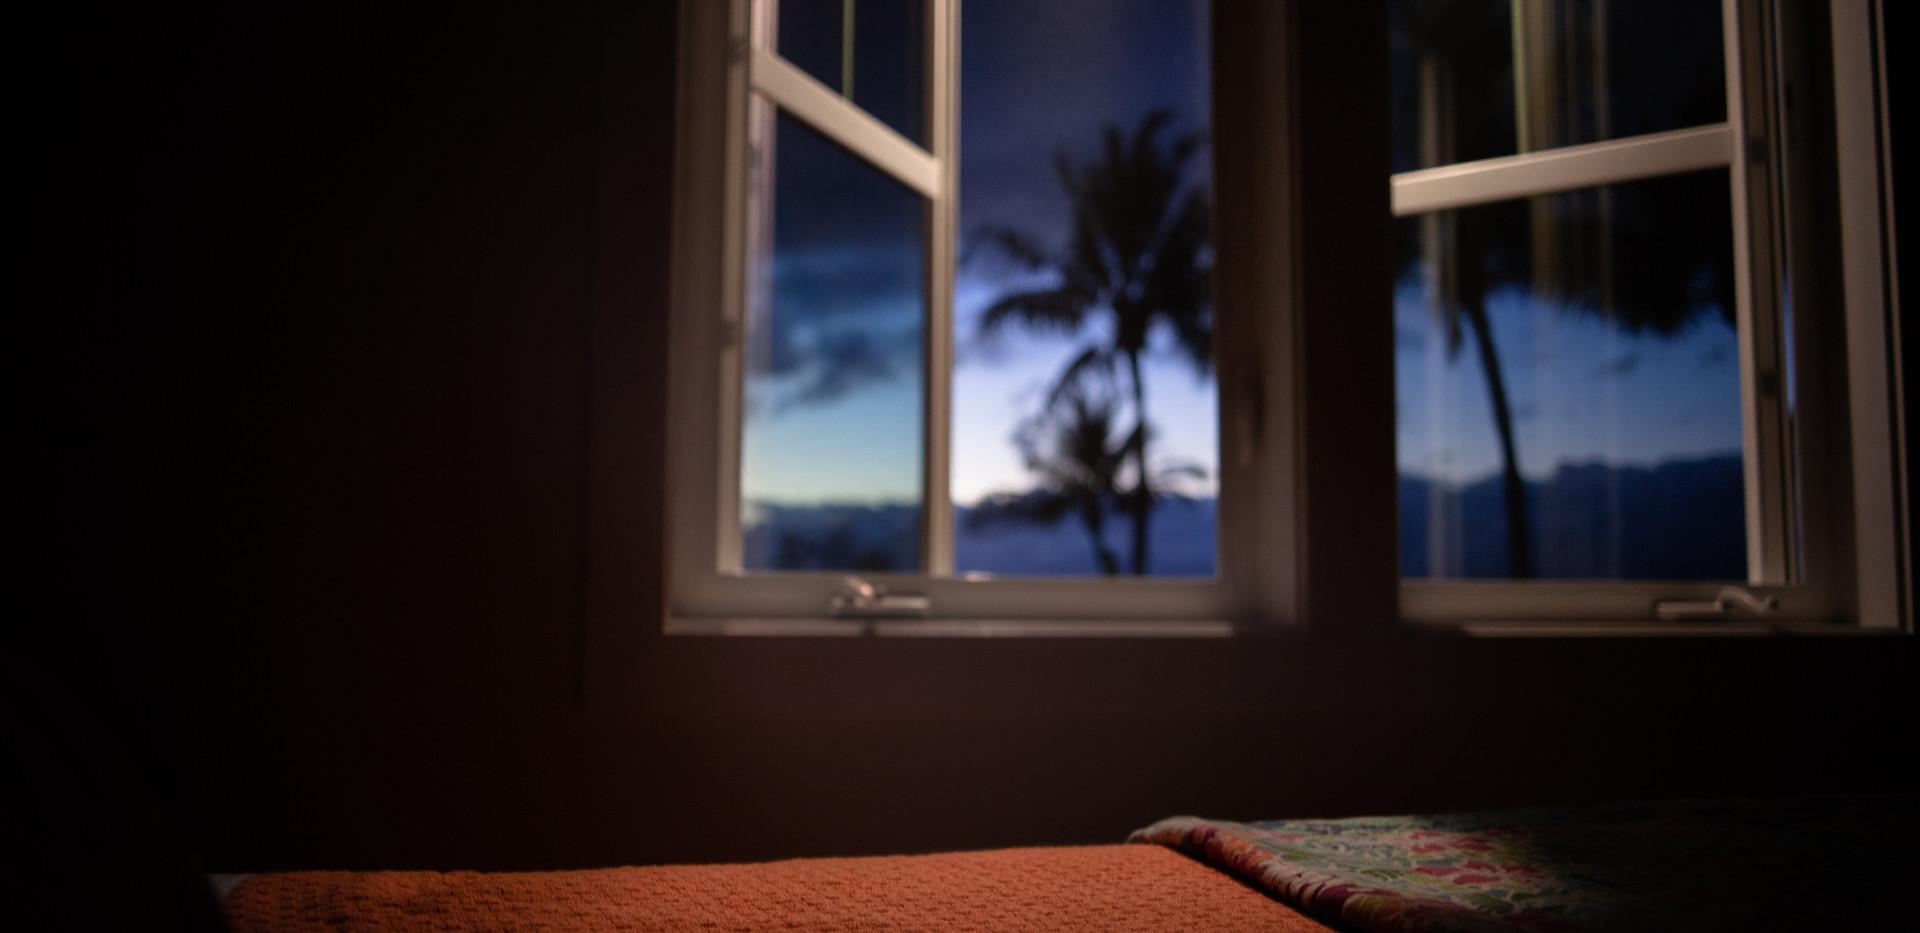 Lonely Bedroom_1 (1 of 1).jpg